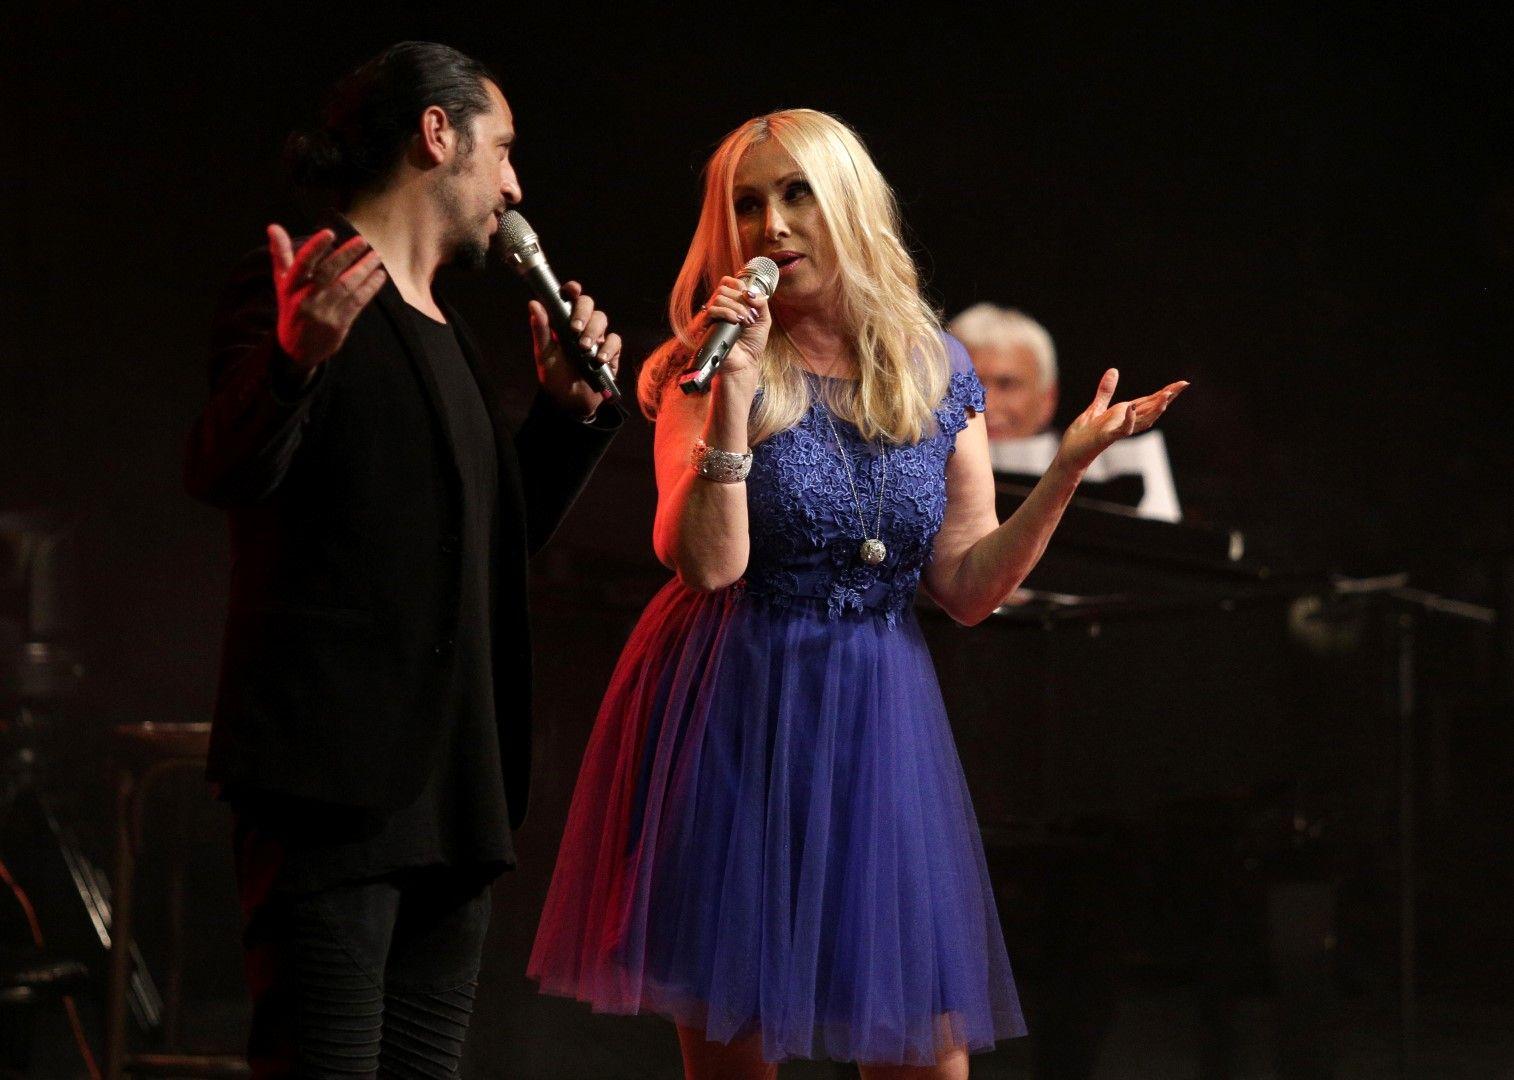 Кристина Димитрова и Стефан Димитров